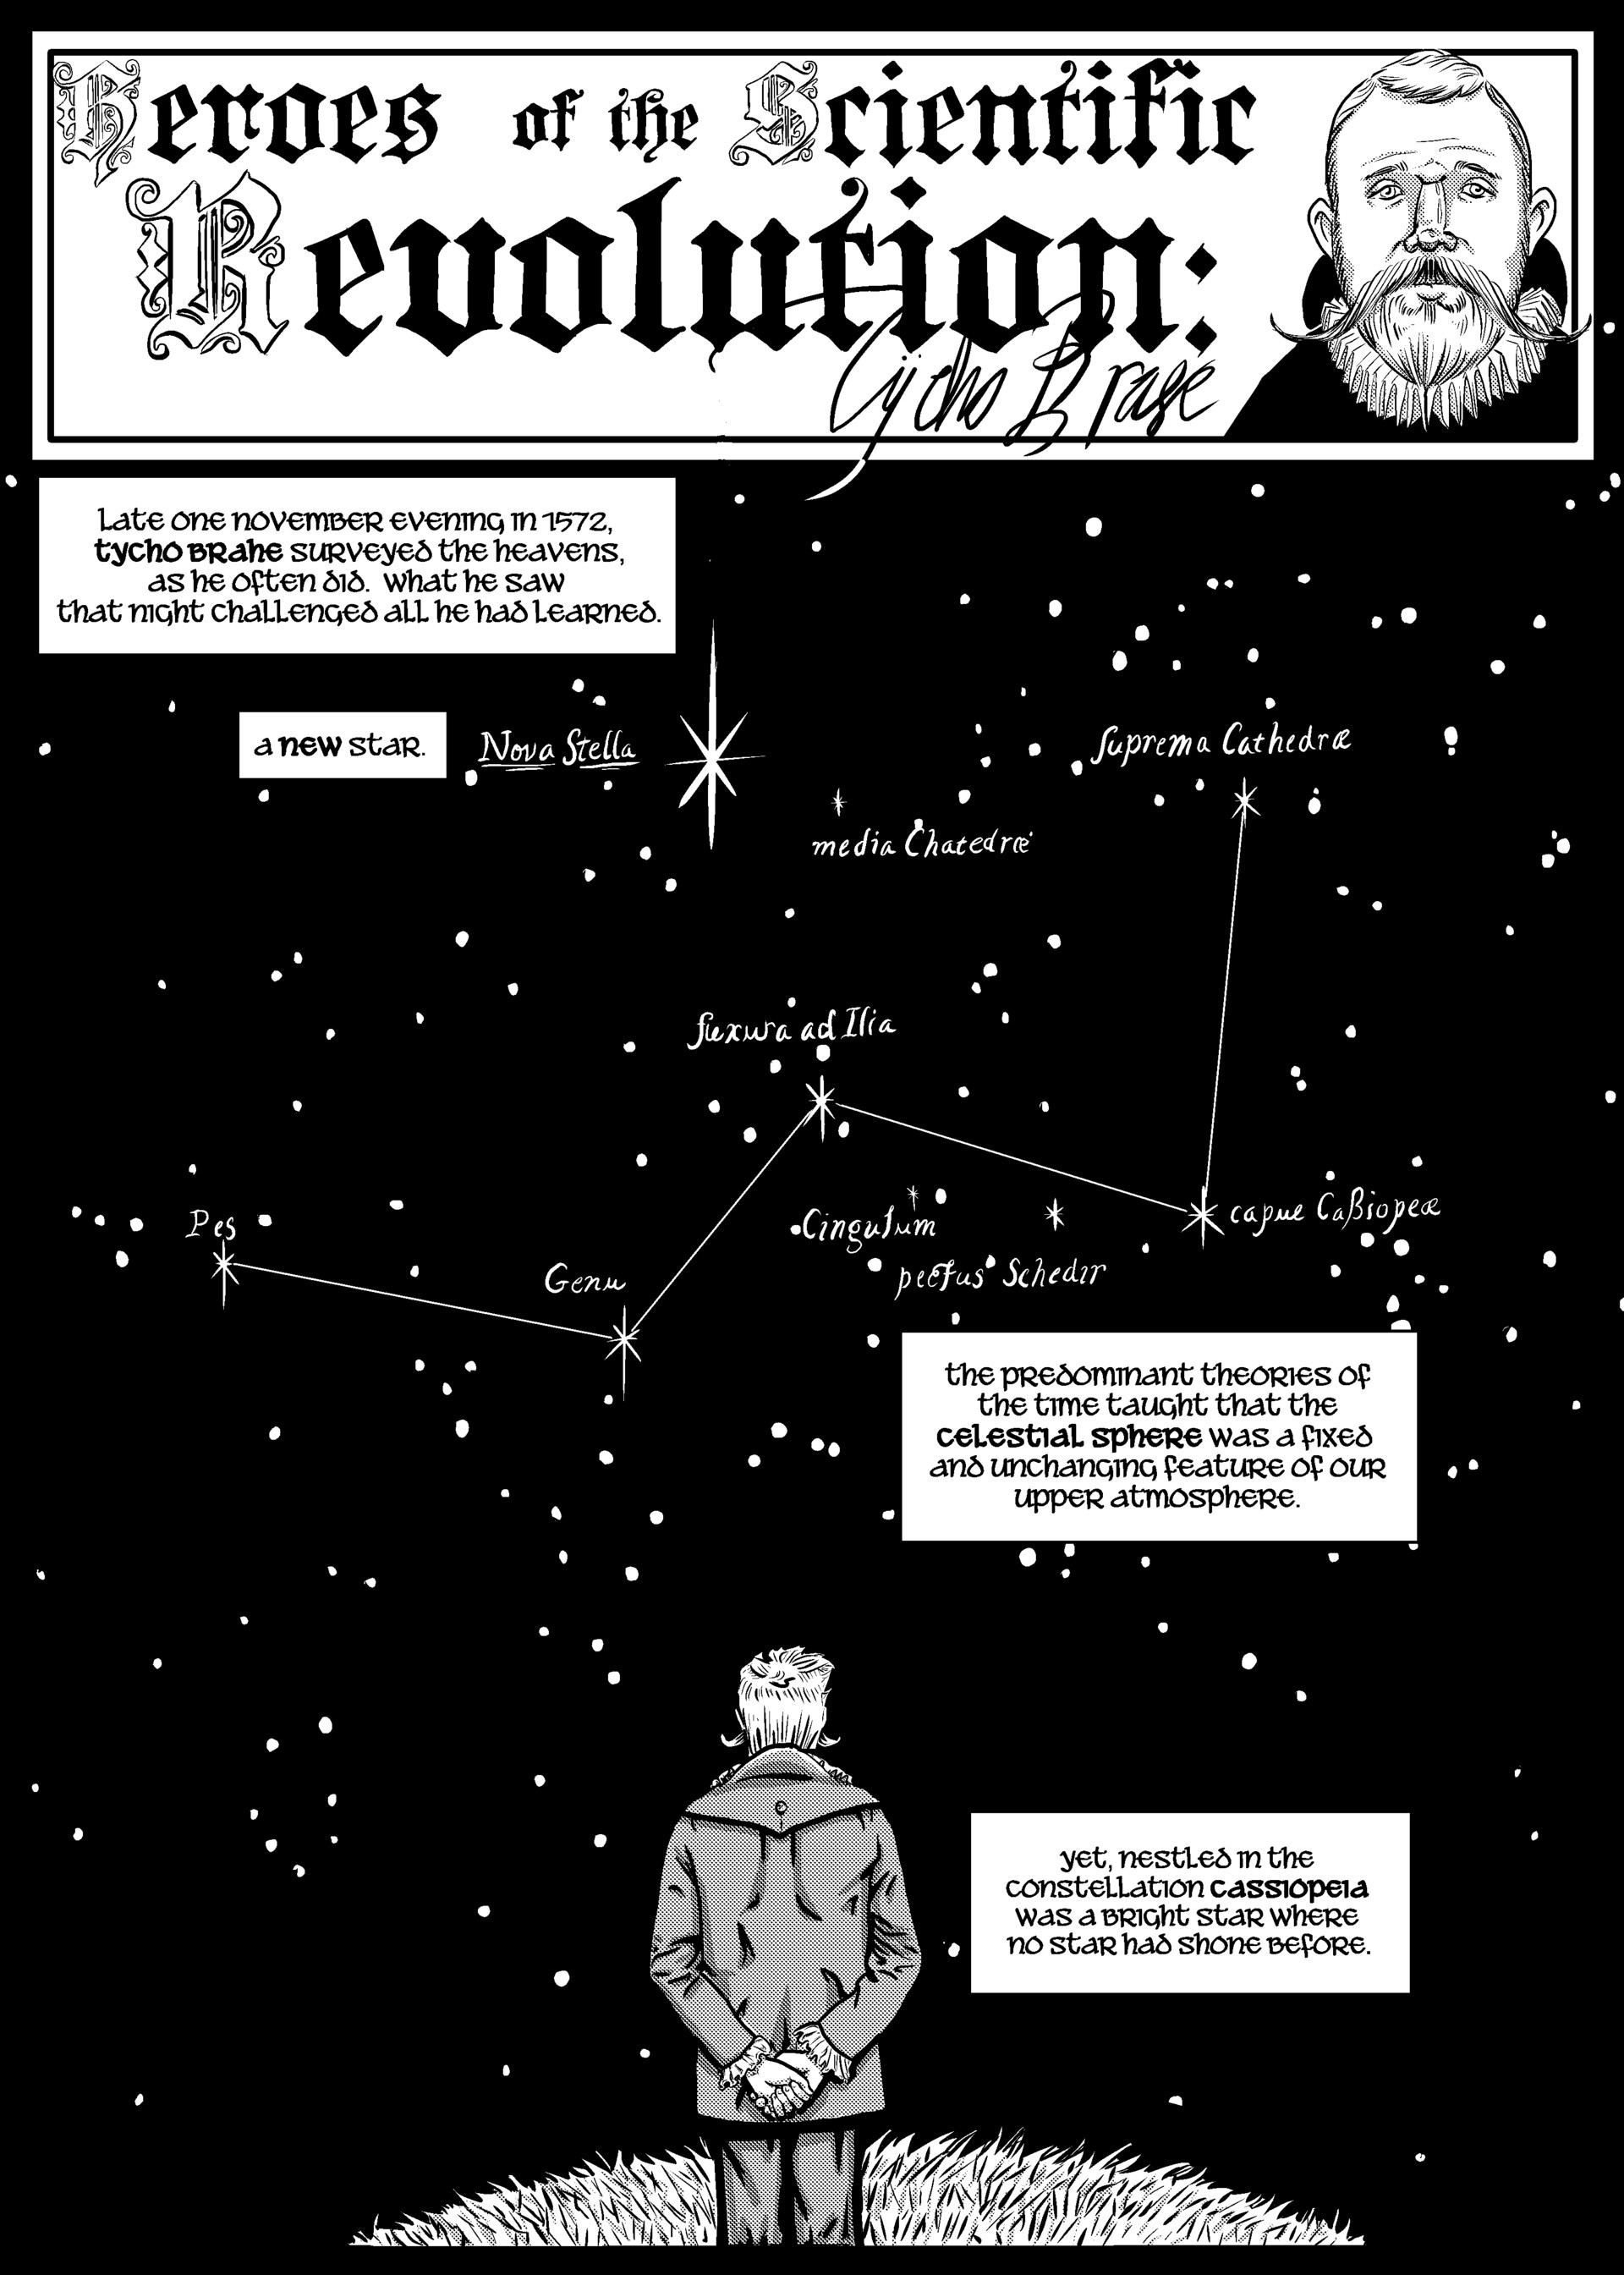 Michael davis heroes of the scientific revolution 001